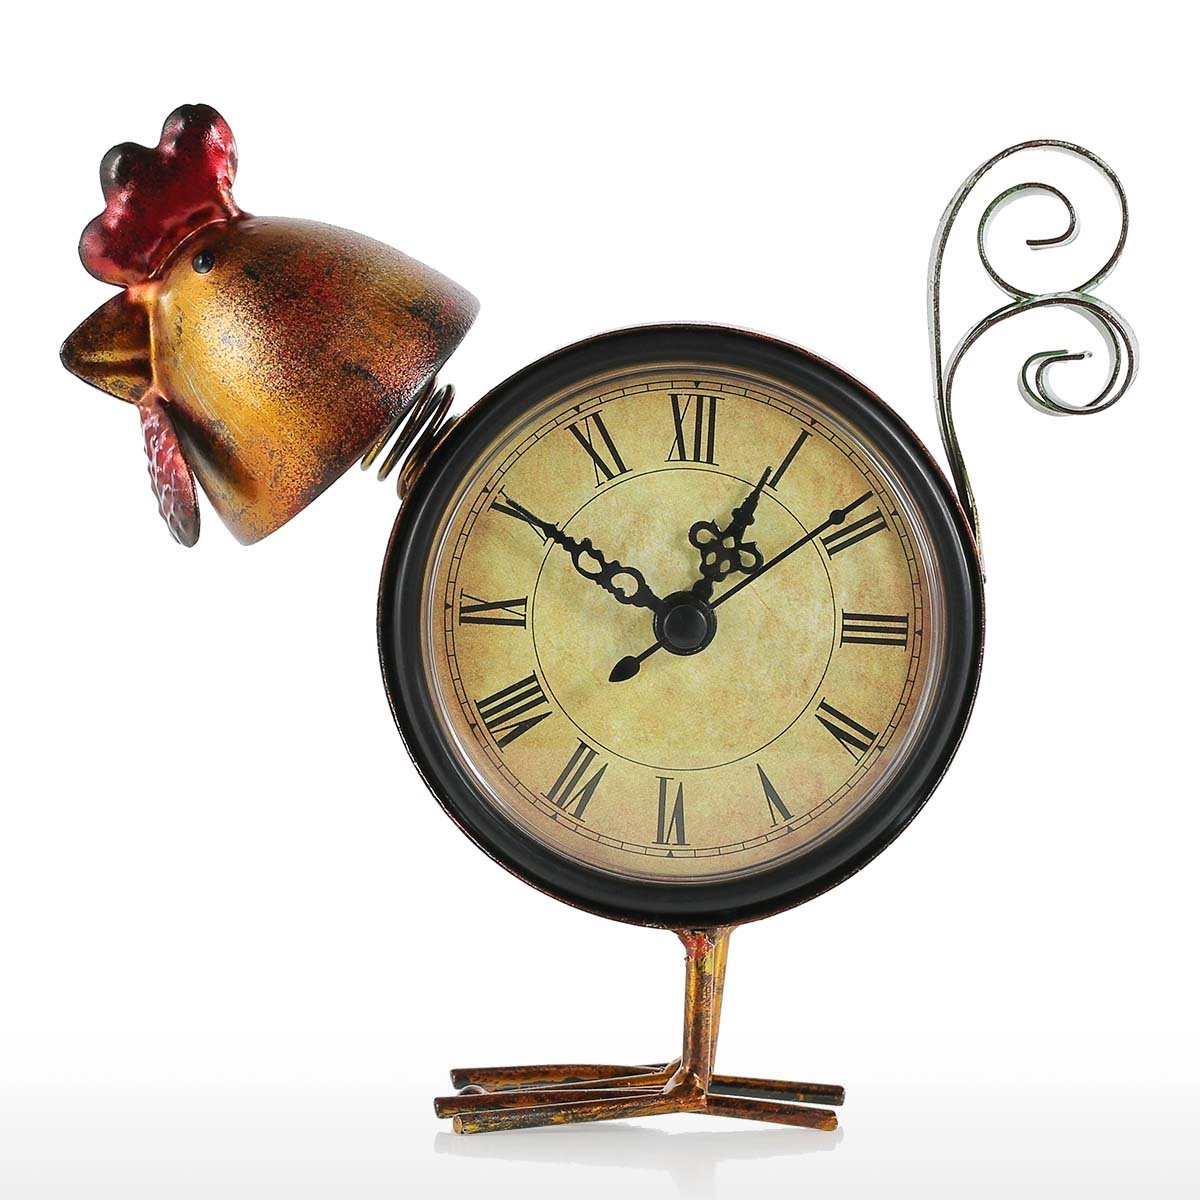 Tooarts Small Desk Clock Battery Operated Handmade Vintage Decorative Shelf Clock Metal Chicken Figurine Shaped